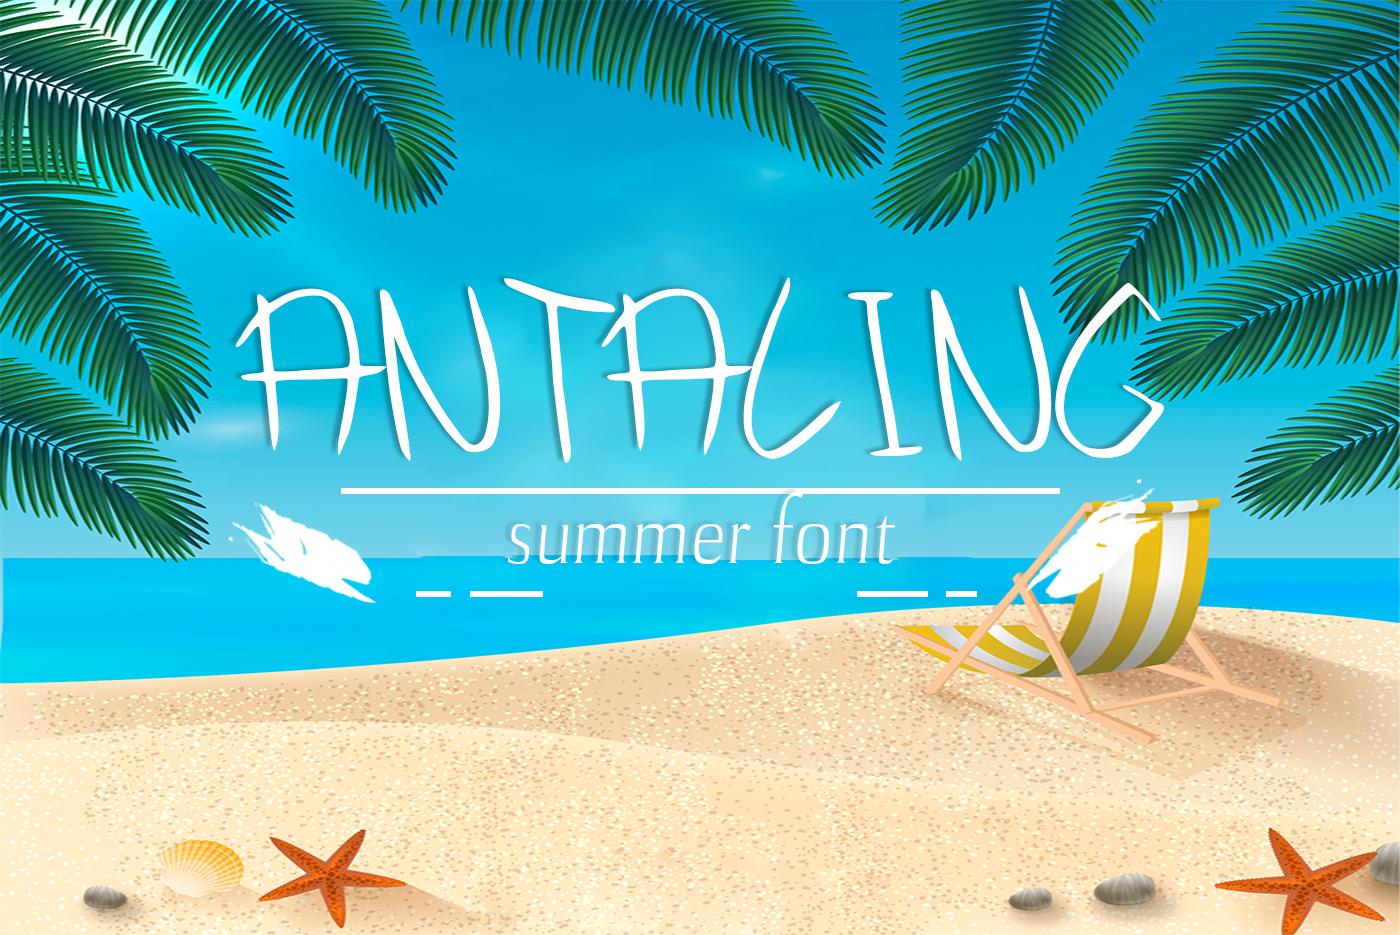 Antaling Summer Font example image 1